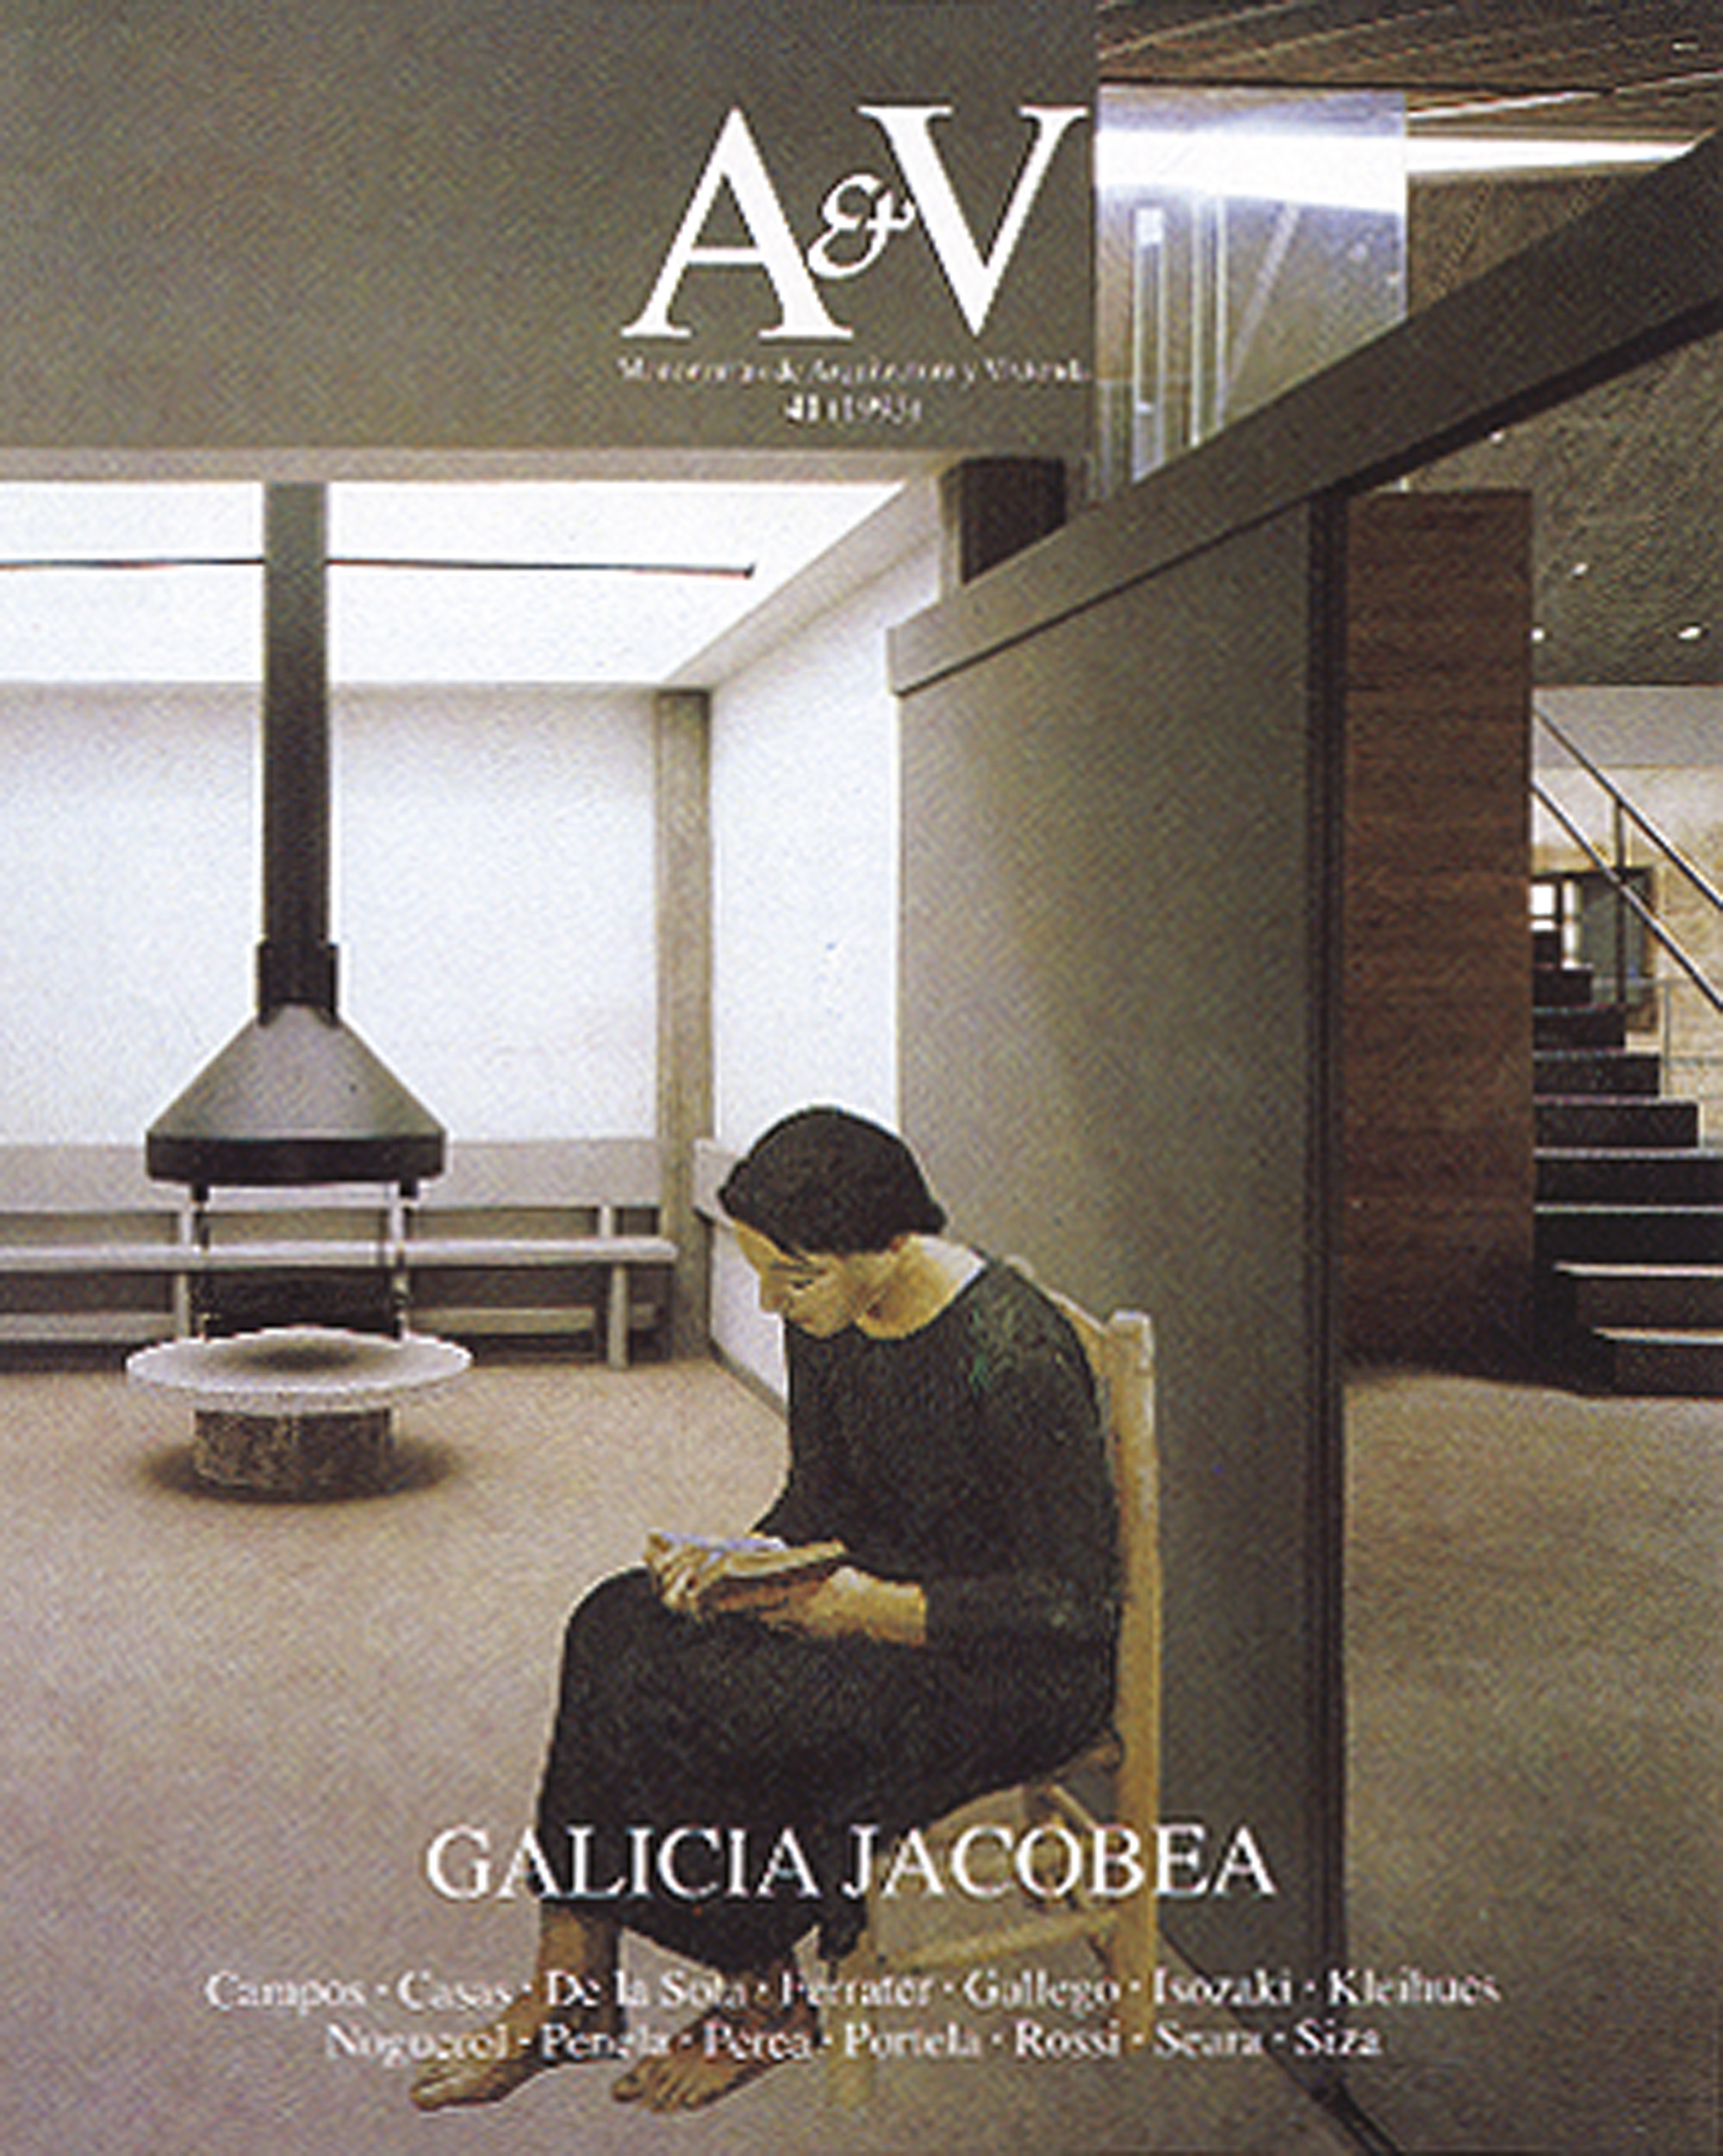 Galicia Jacobea